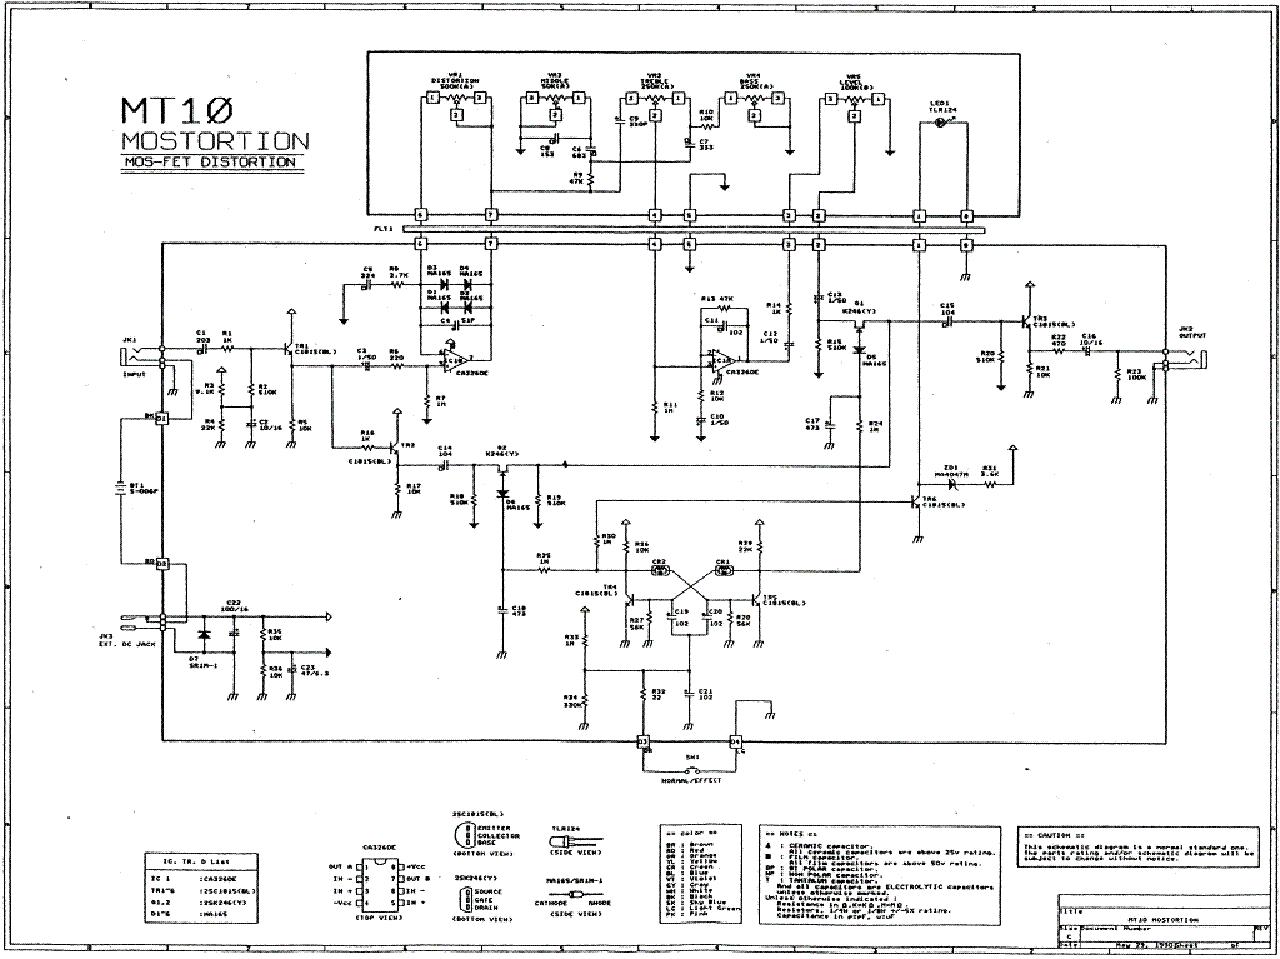 Ibanez Pd7 Schematic Custom Wiring Diagram Grg Ts5 Tubescreamer Sch Service Manual Download Schematics Rh Elektrotanya Com 5 Way Switch Gio